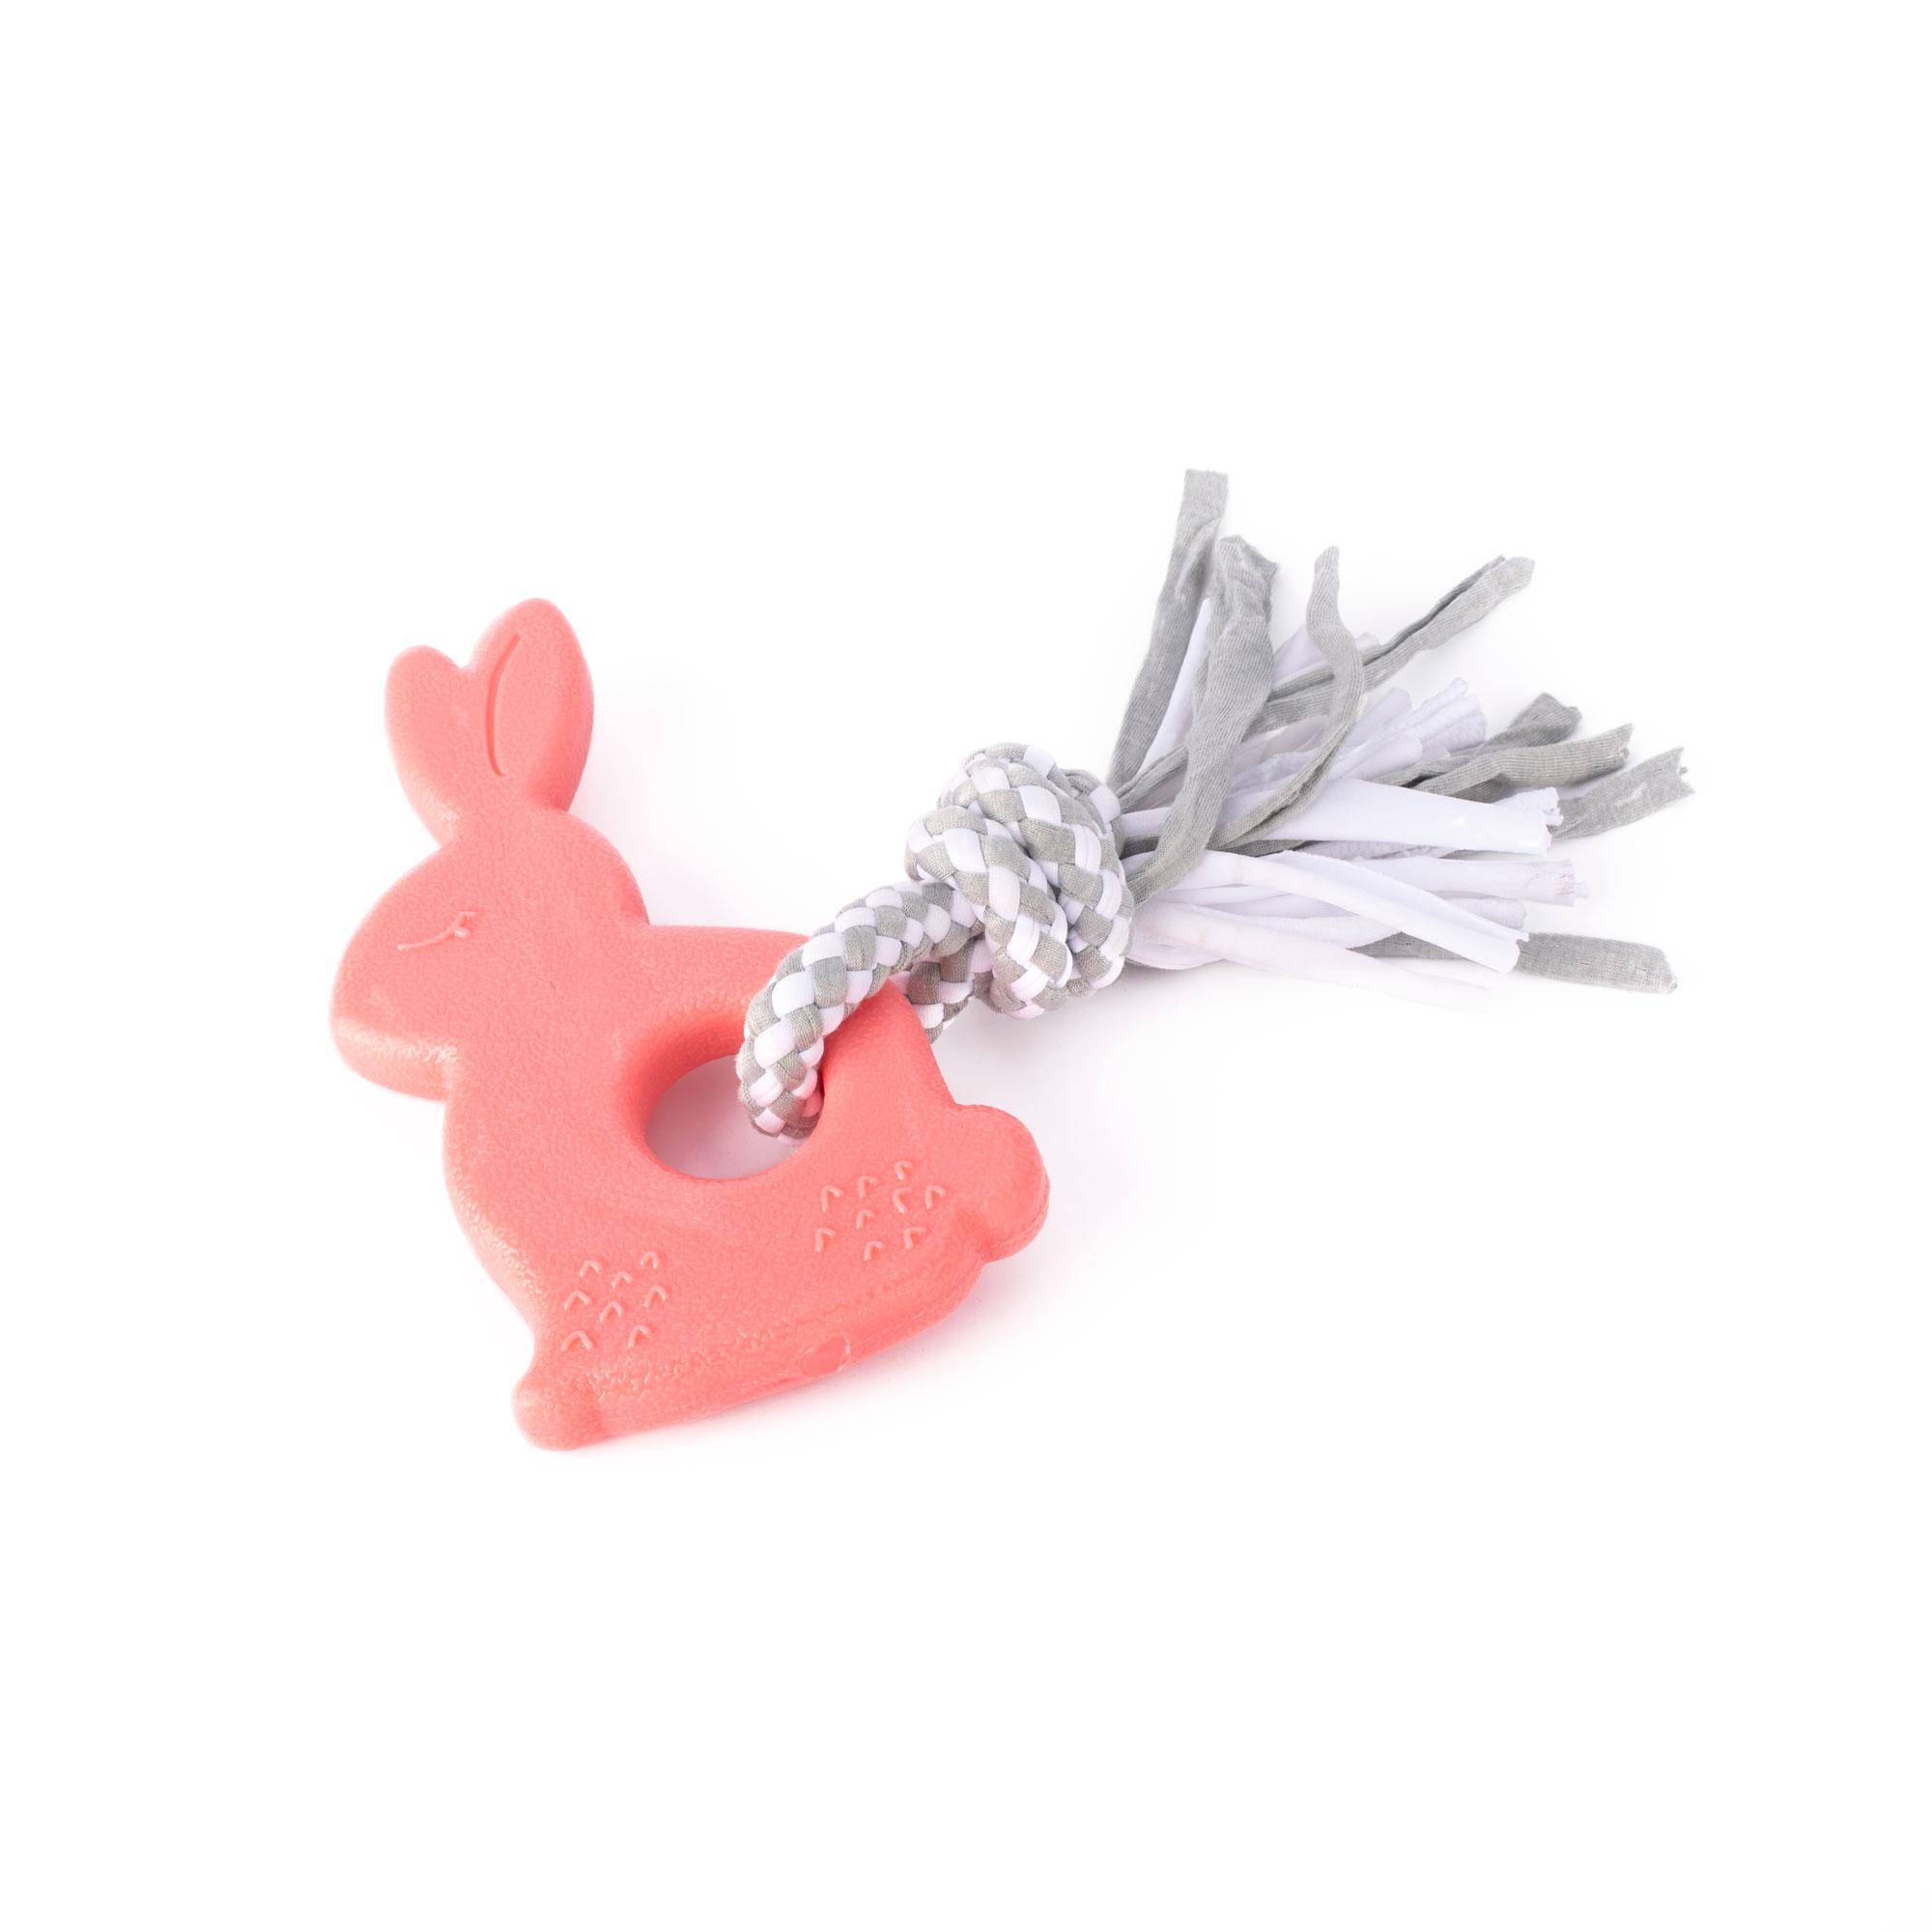 Bonnie the bunny - Tuff Teetherz